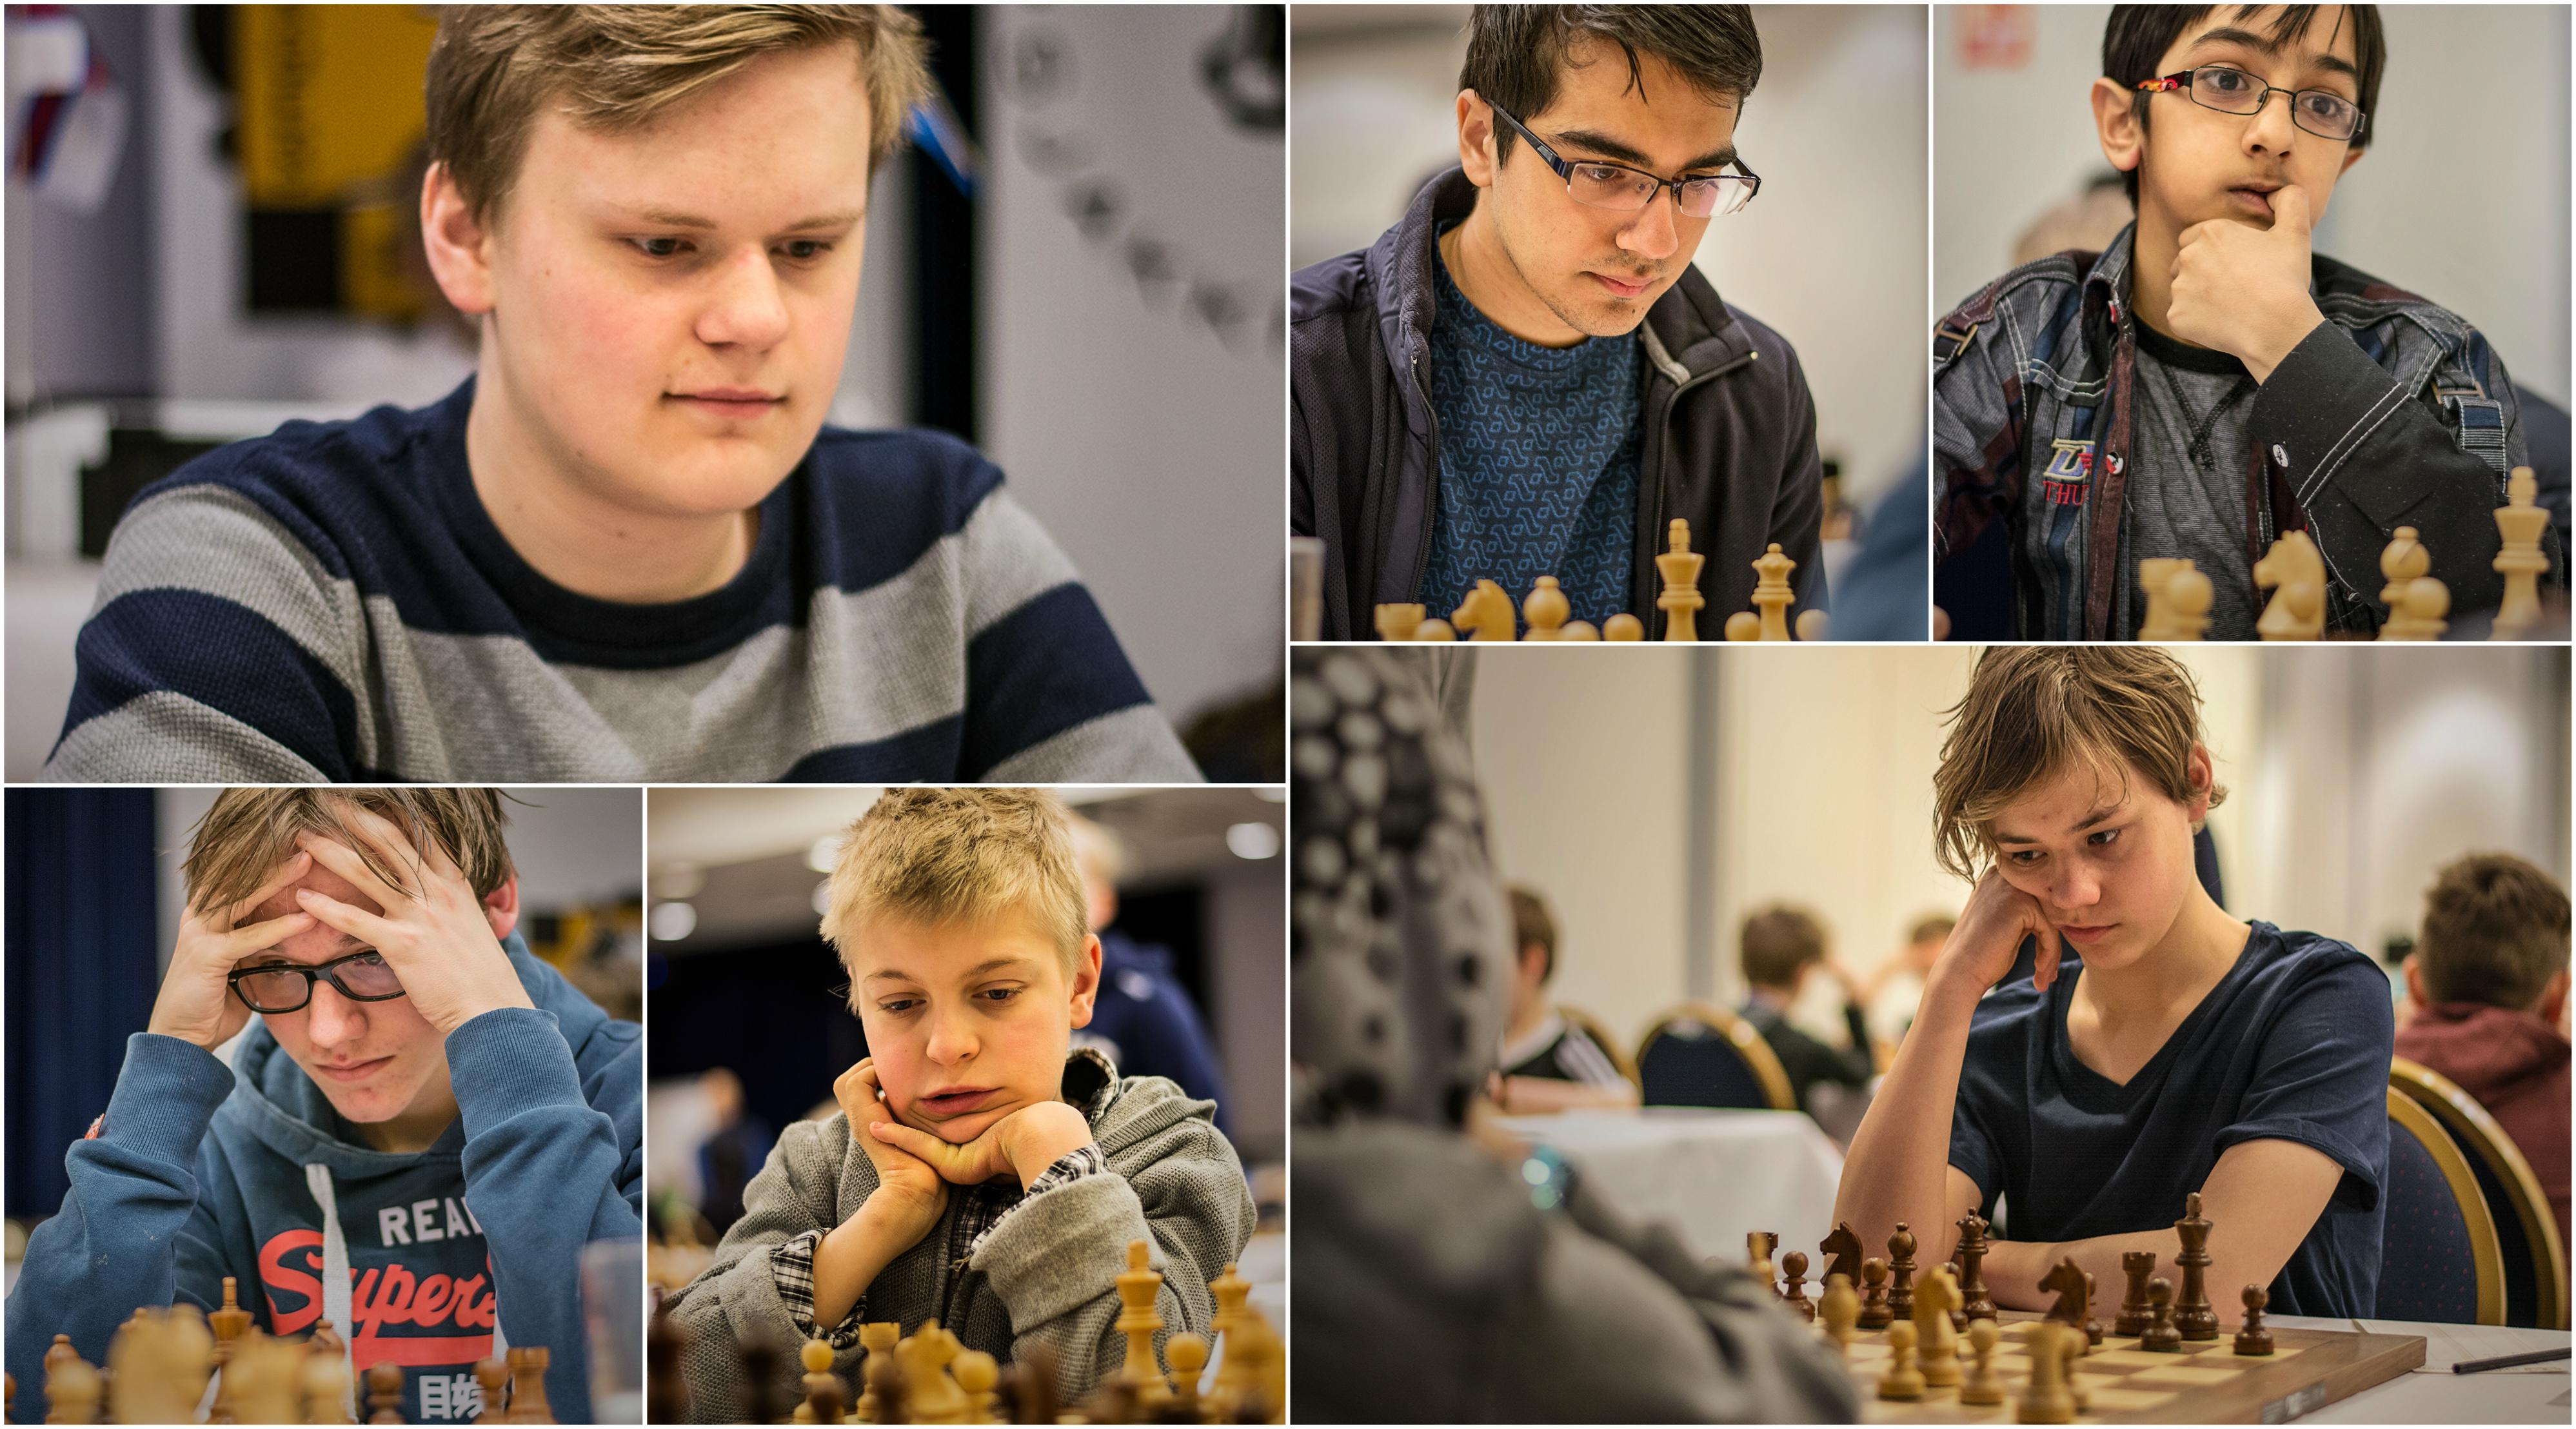 De 6 norske medaljørene. Alle foto: Kristoffer Gressli/USF